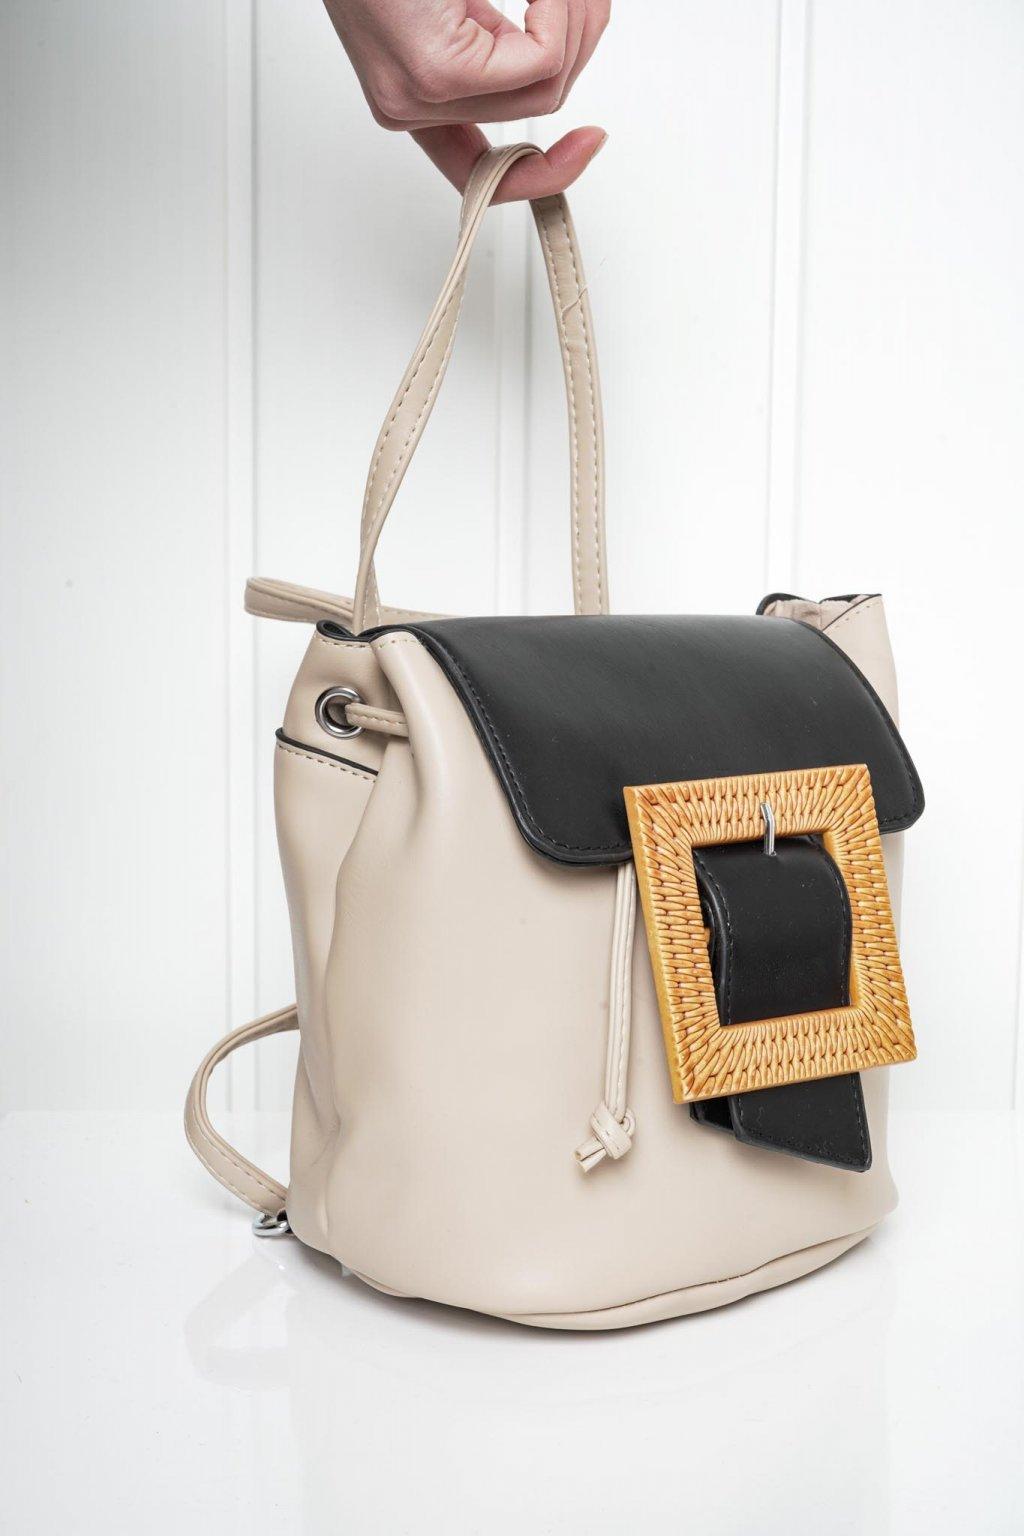 Kabelka, crossbody, ruksak, shopping bag, shopperka, 106